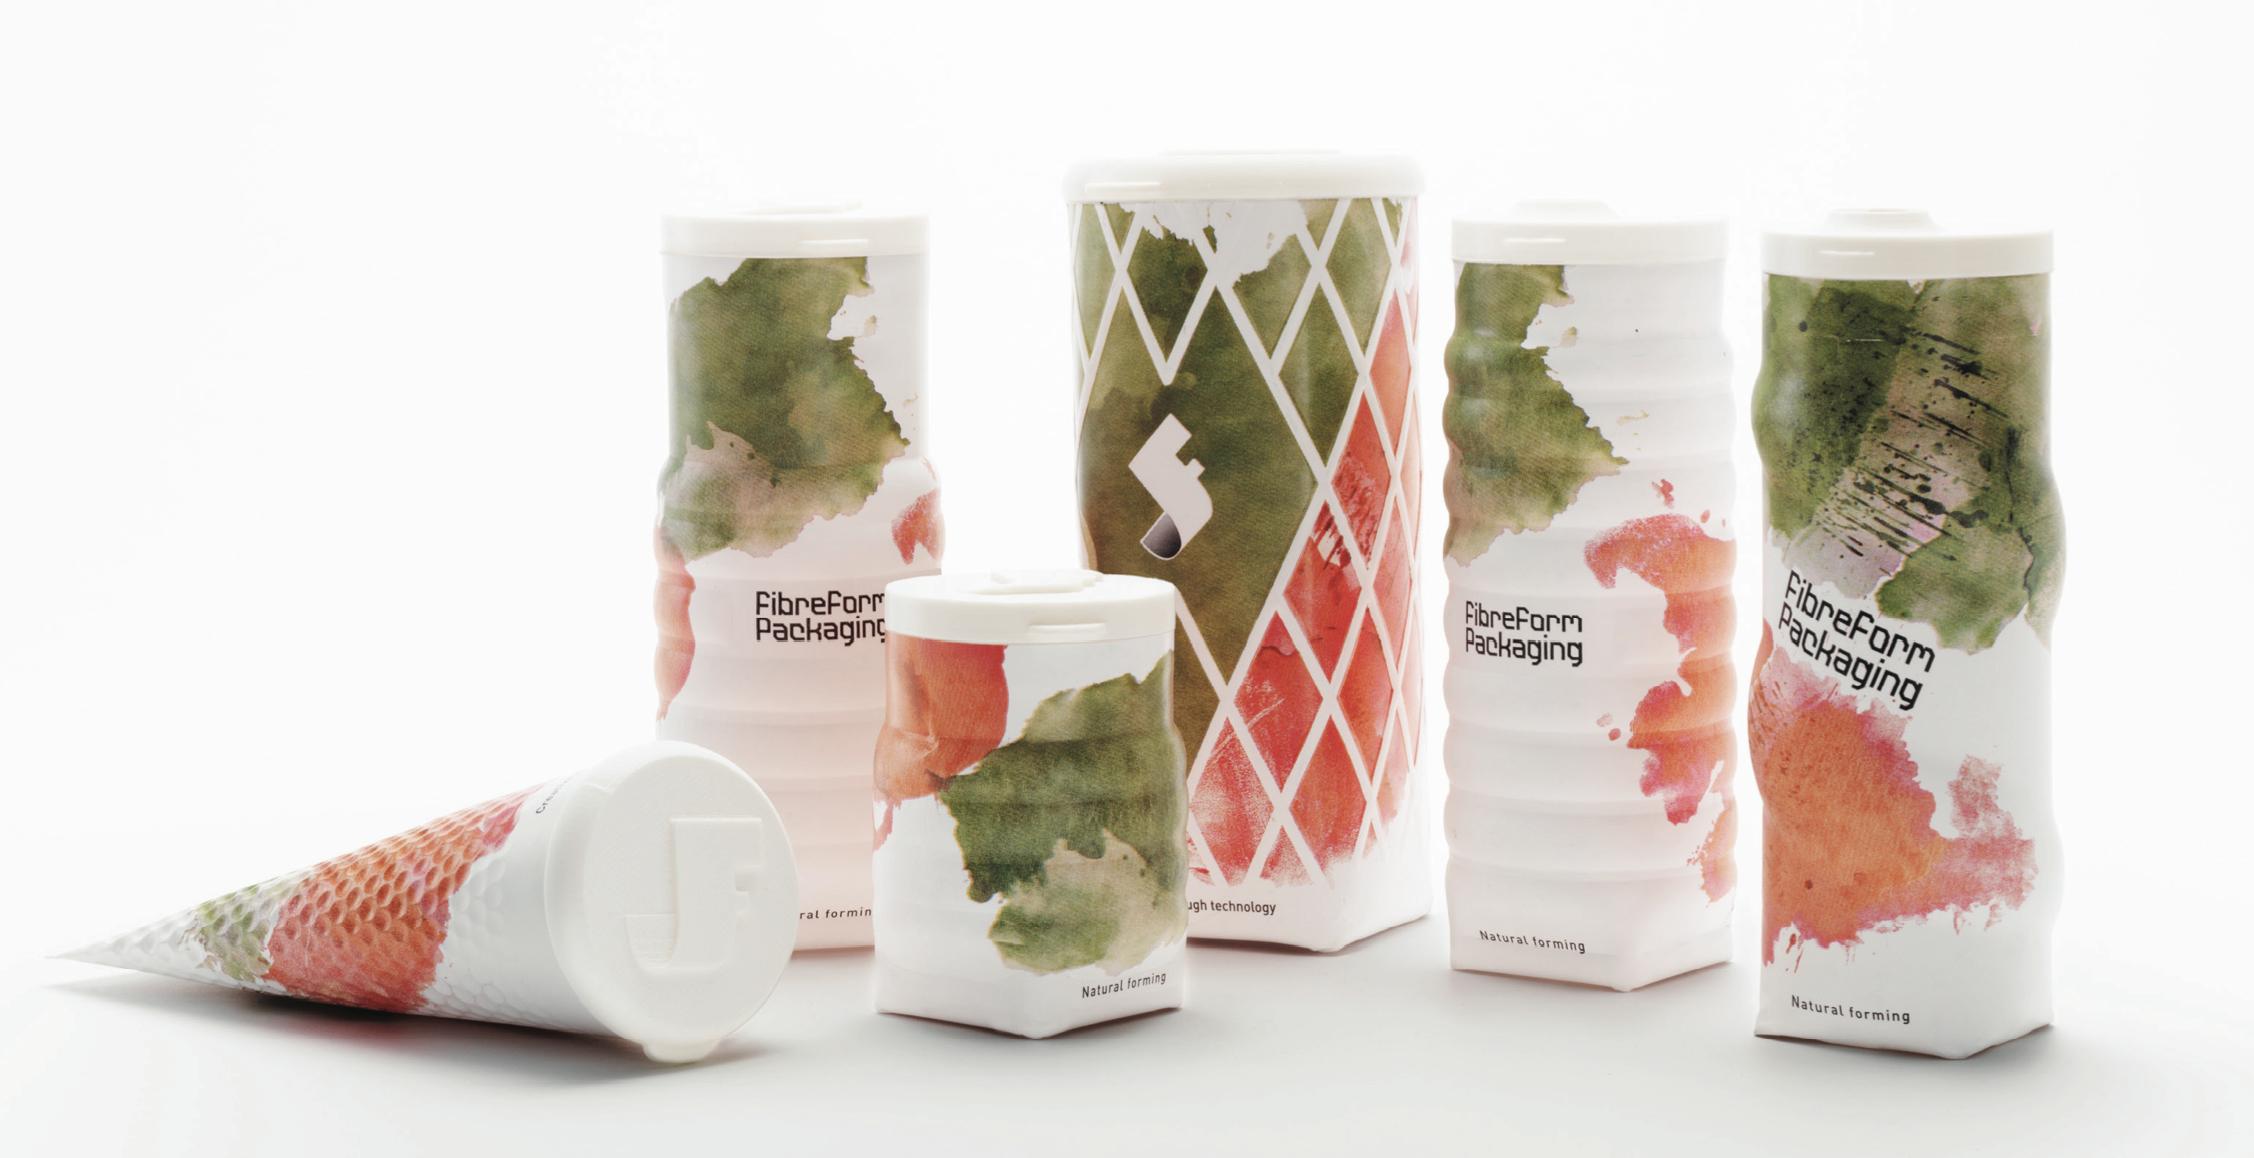 FibreForm Packaging – Ambalaj